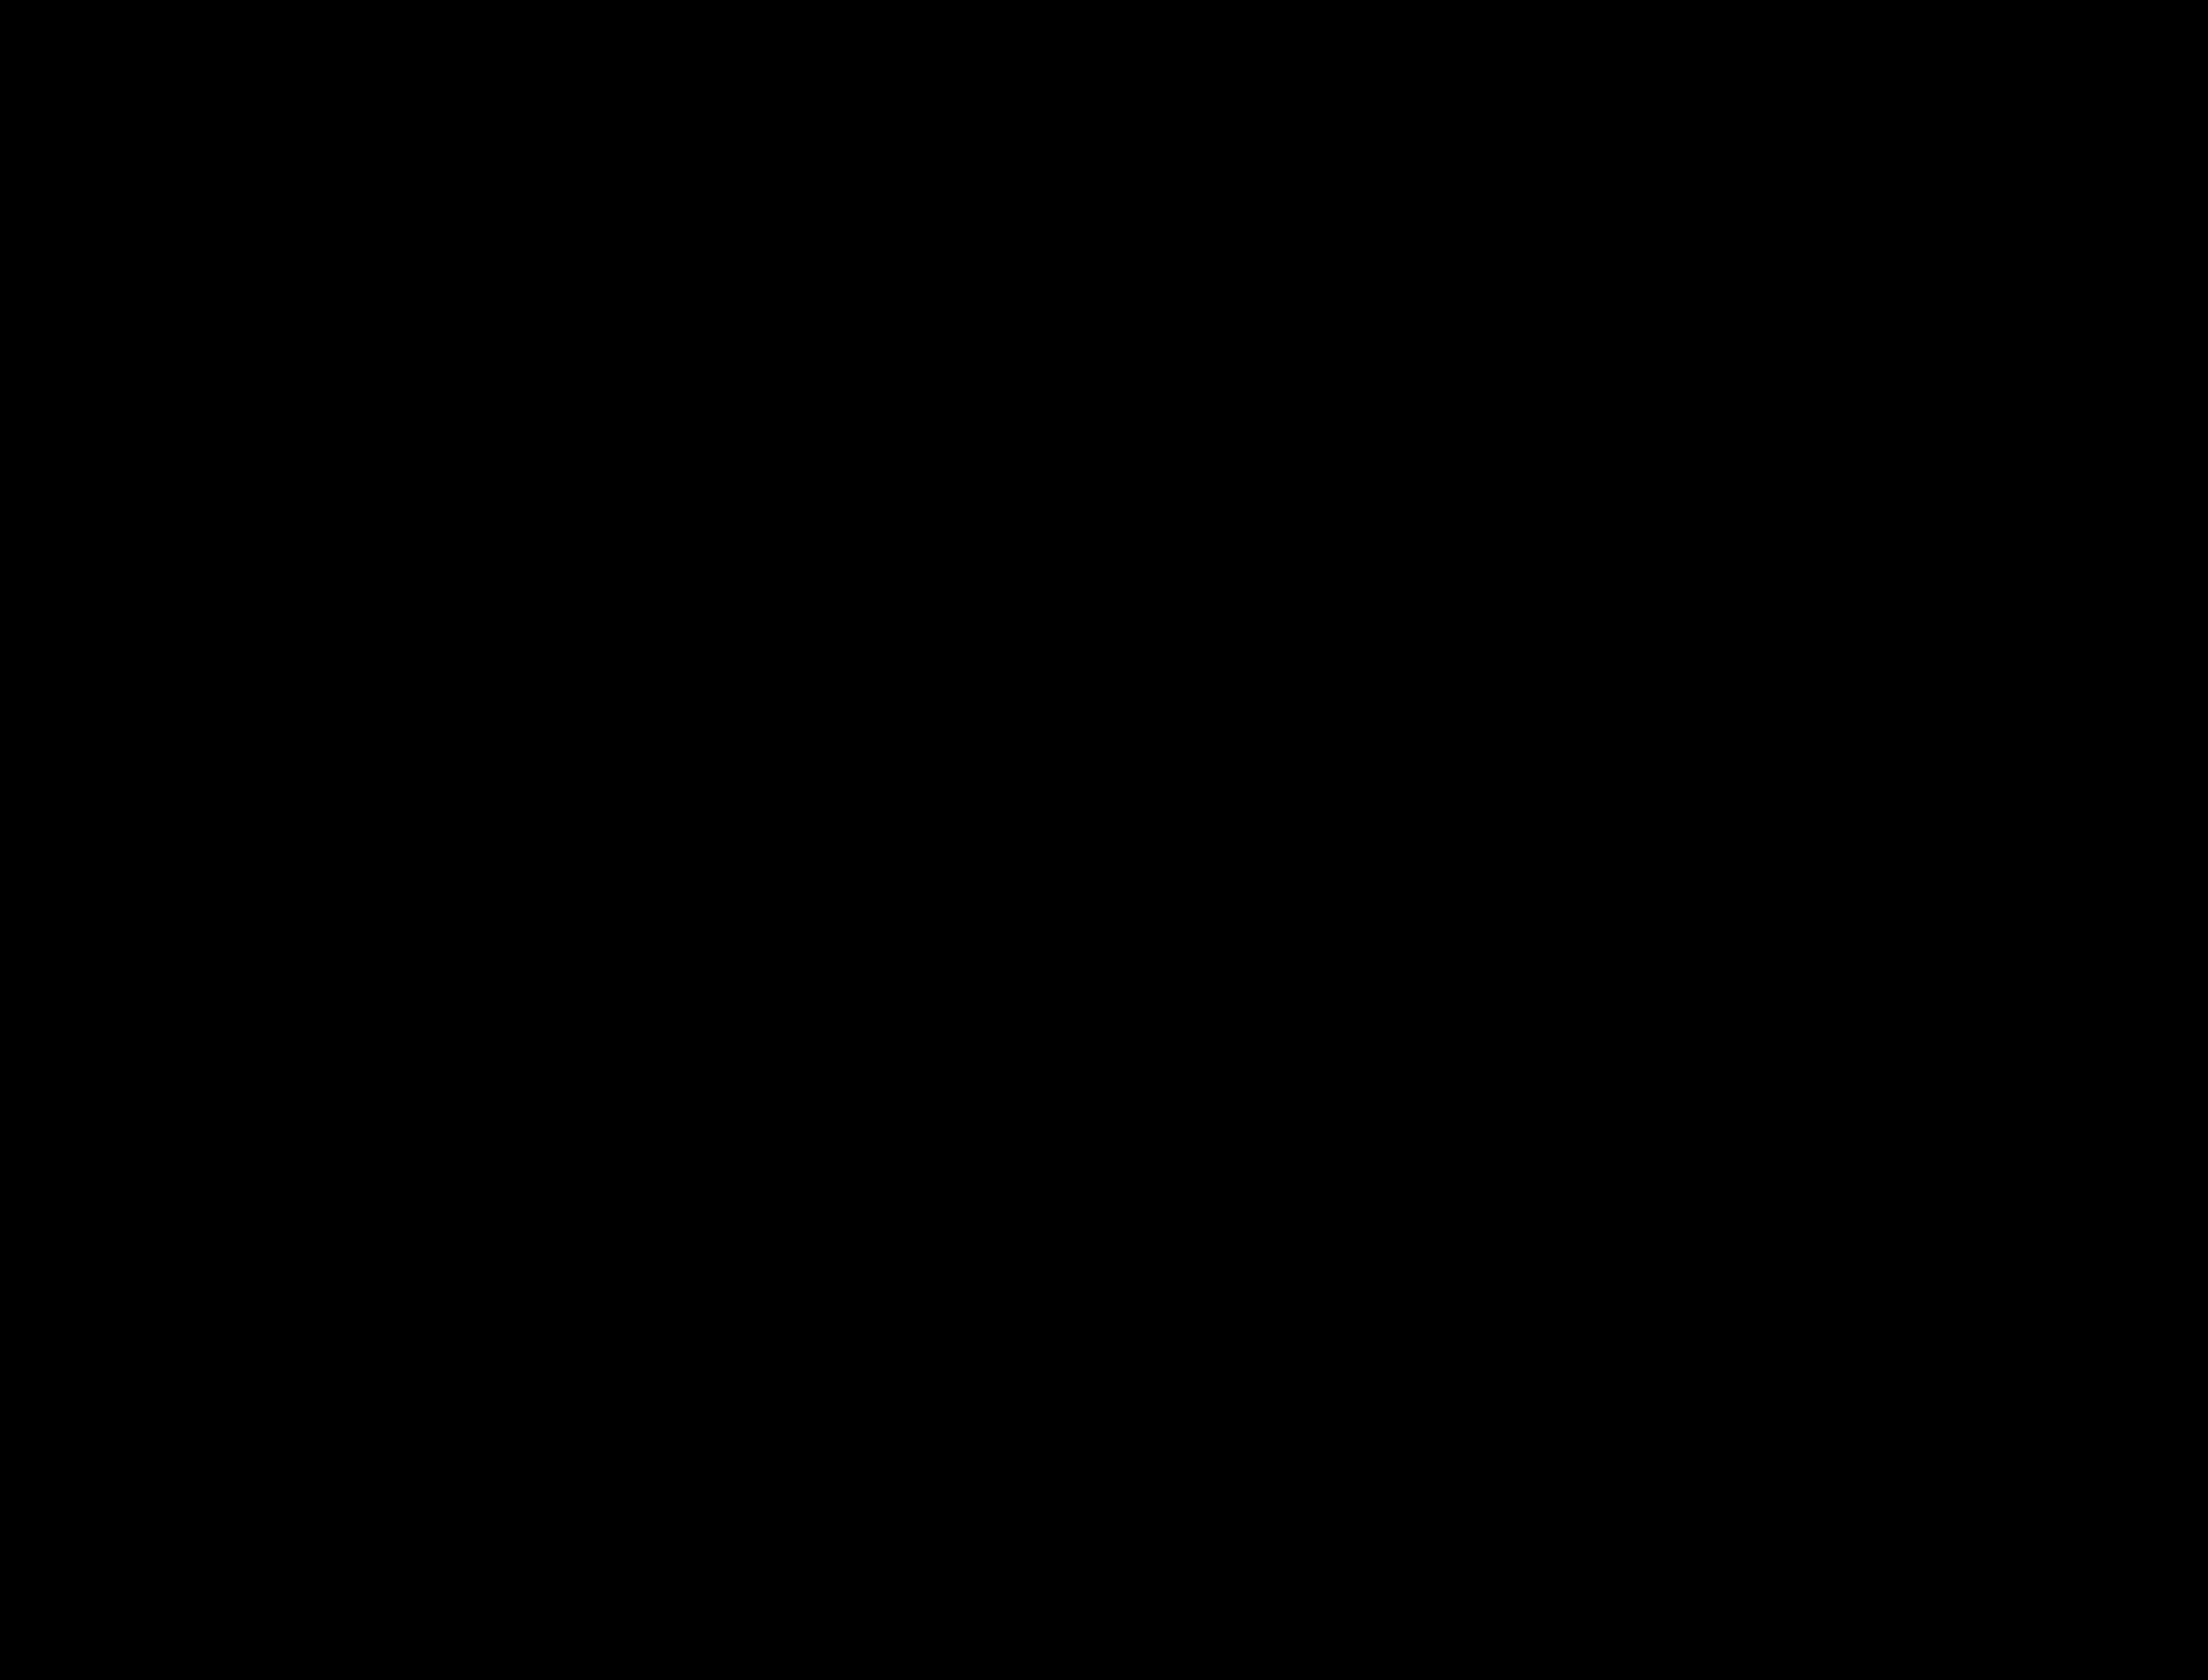 2400x1826 Clipart